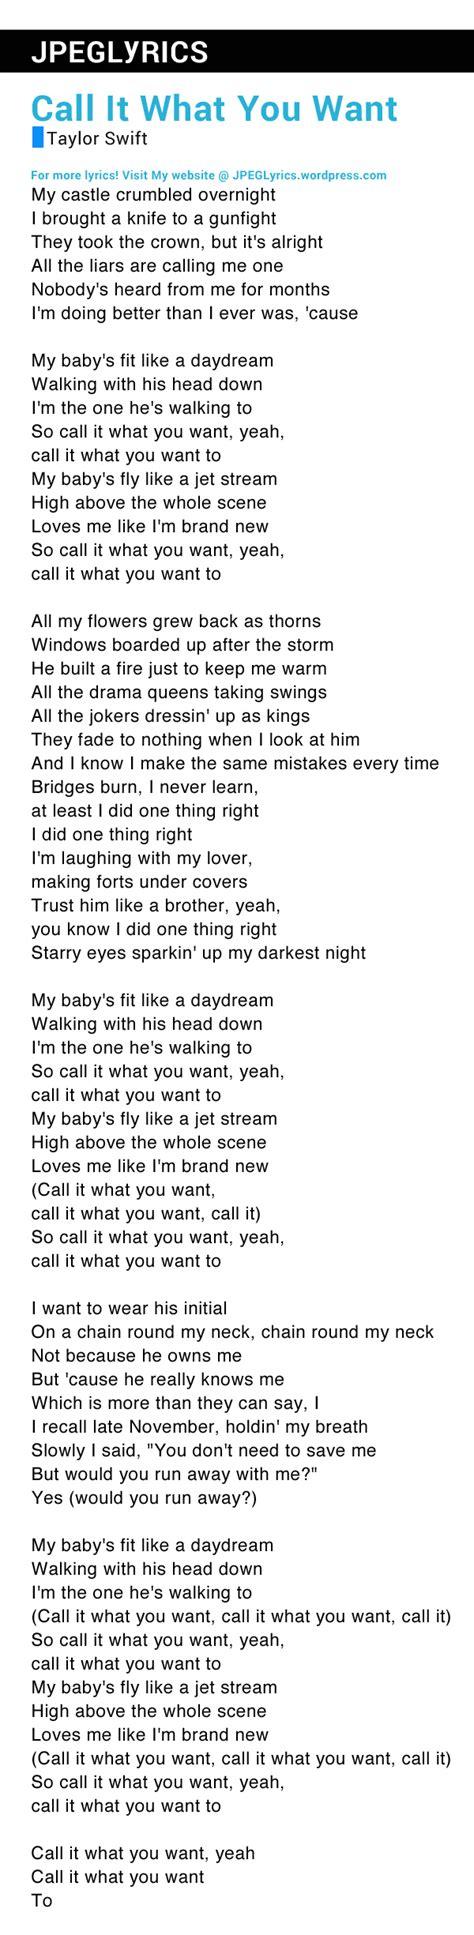 taylor swift call it what you want lyrics download call it what you want by taylor swift lyrics jpeg lyrics